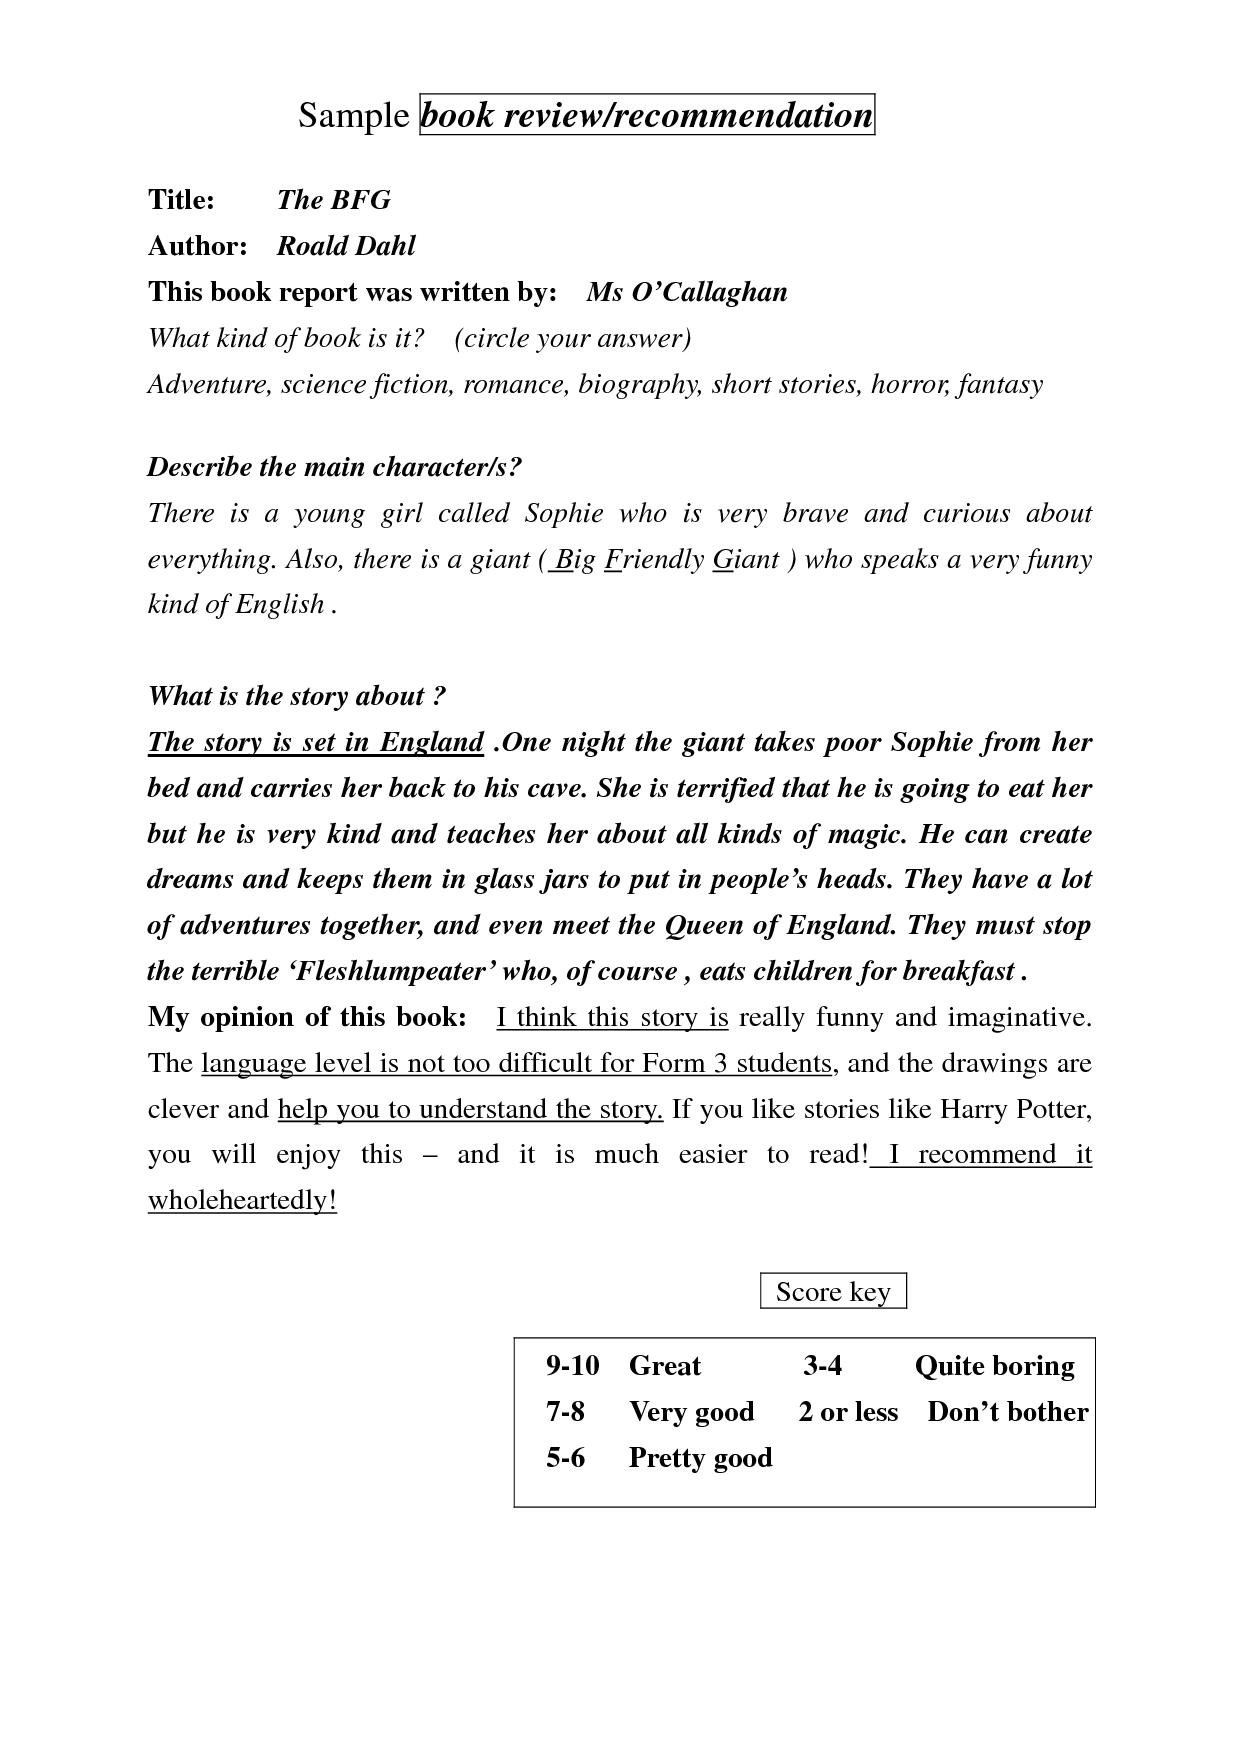 bfg book summary book report bfg pinterest book summaries